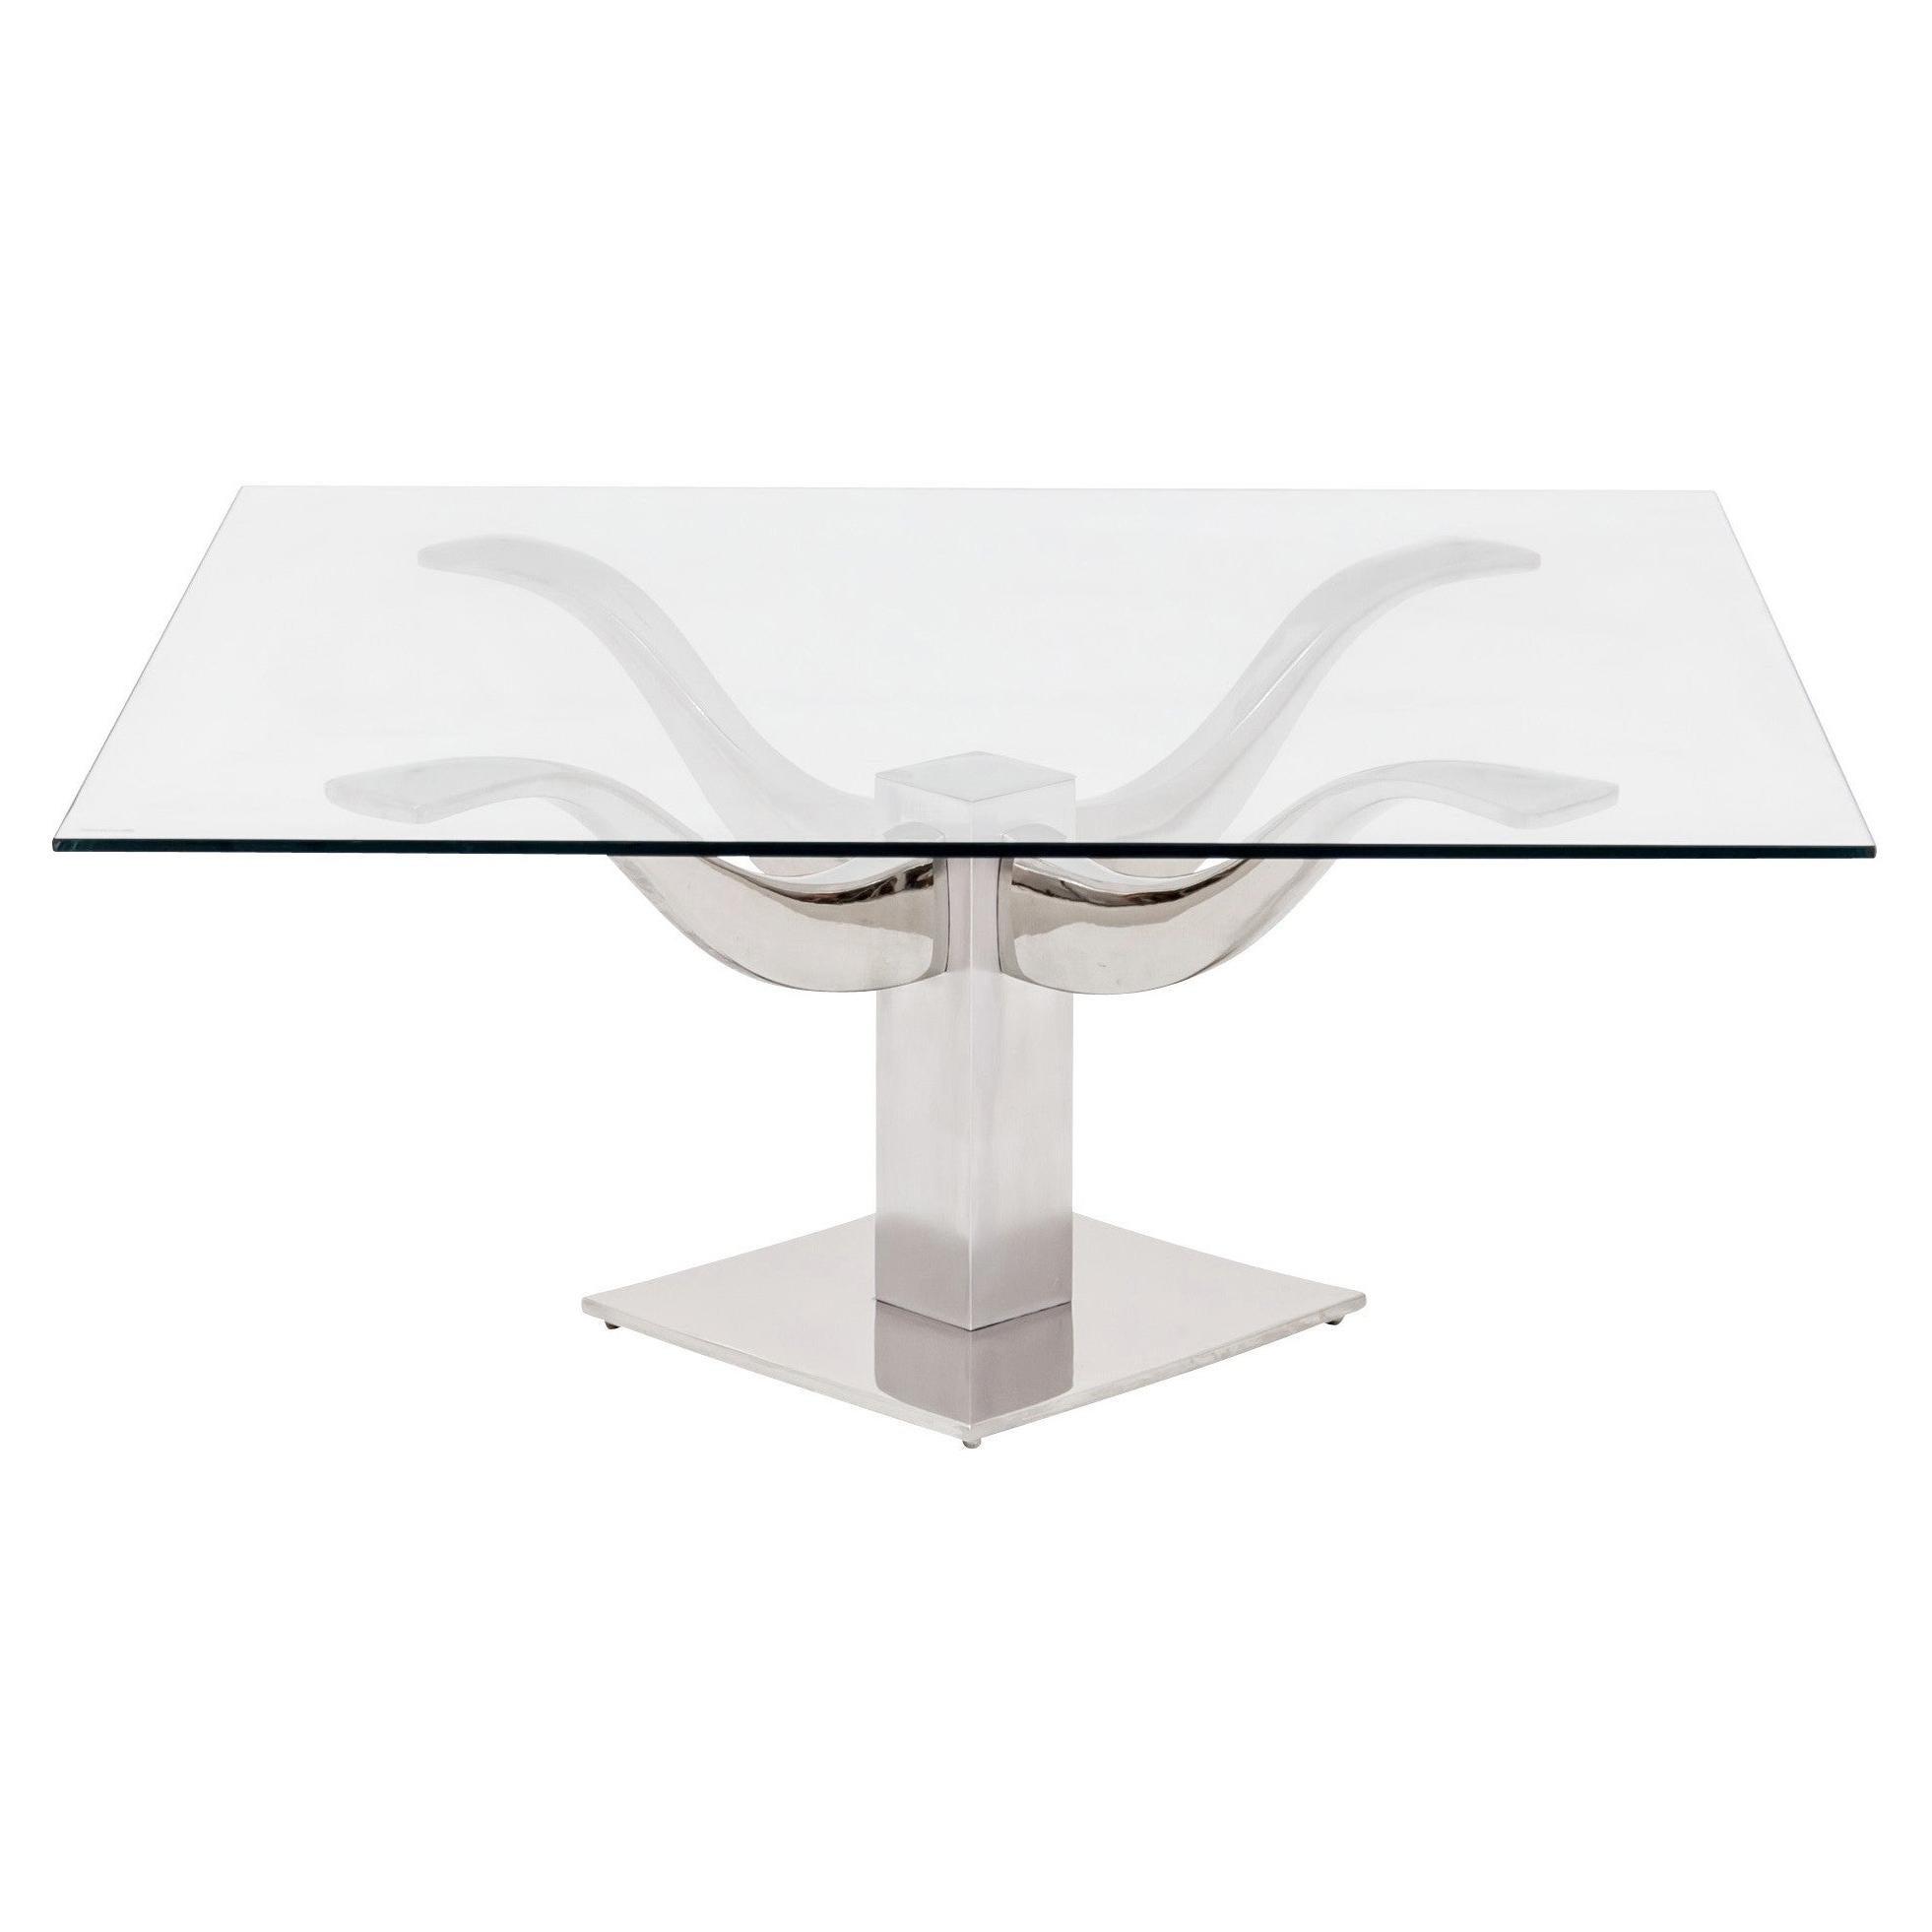 Mid-Century Modern Chrome & Glass Top 4-Arm Pedestal Coffee Table